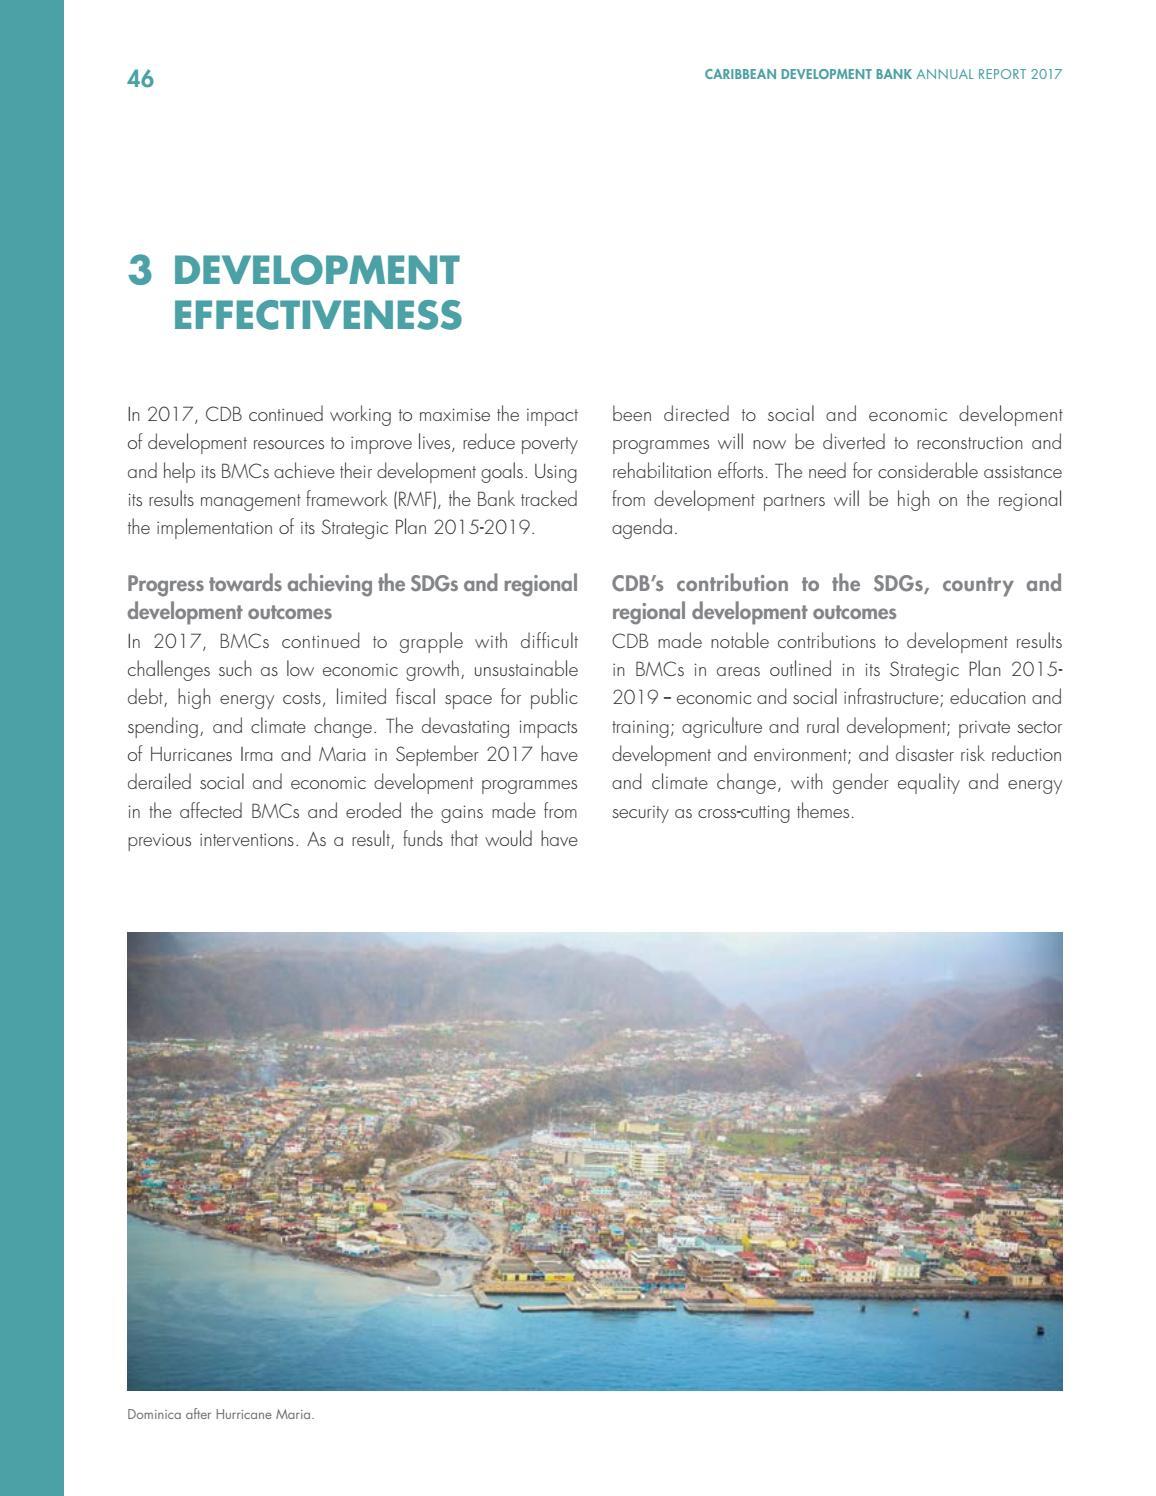 CDB's Annual Report 2017 by Caribbean Development Bank - issuu